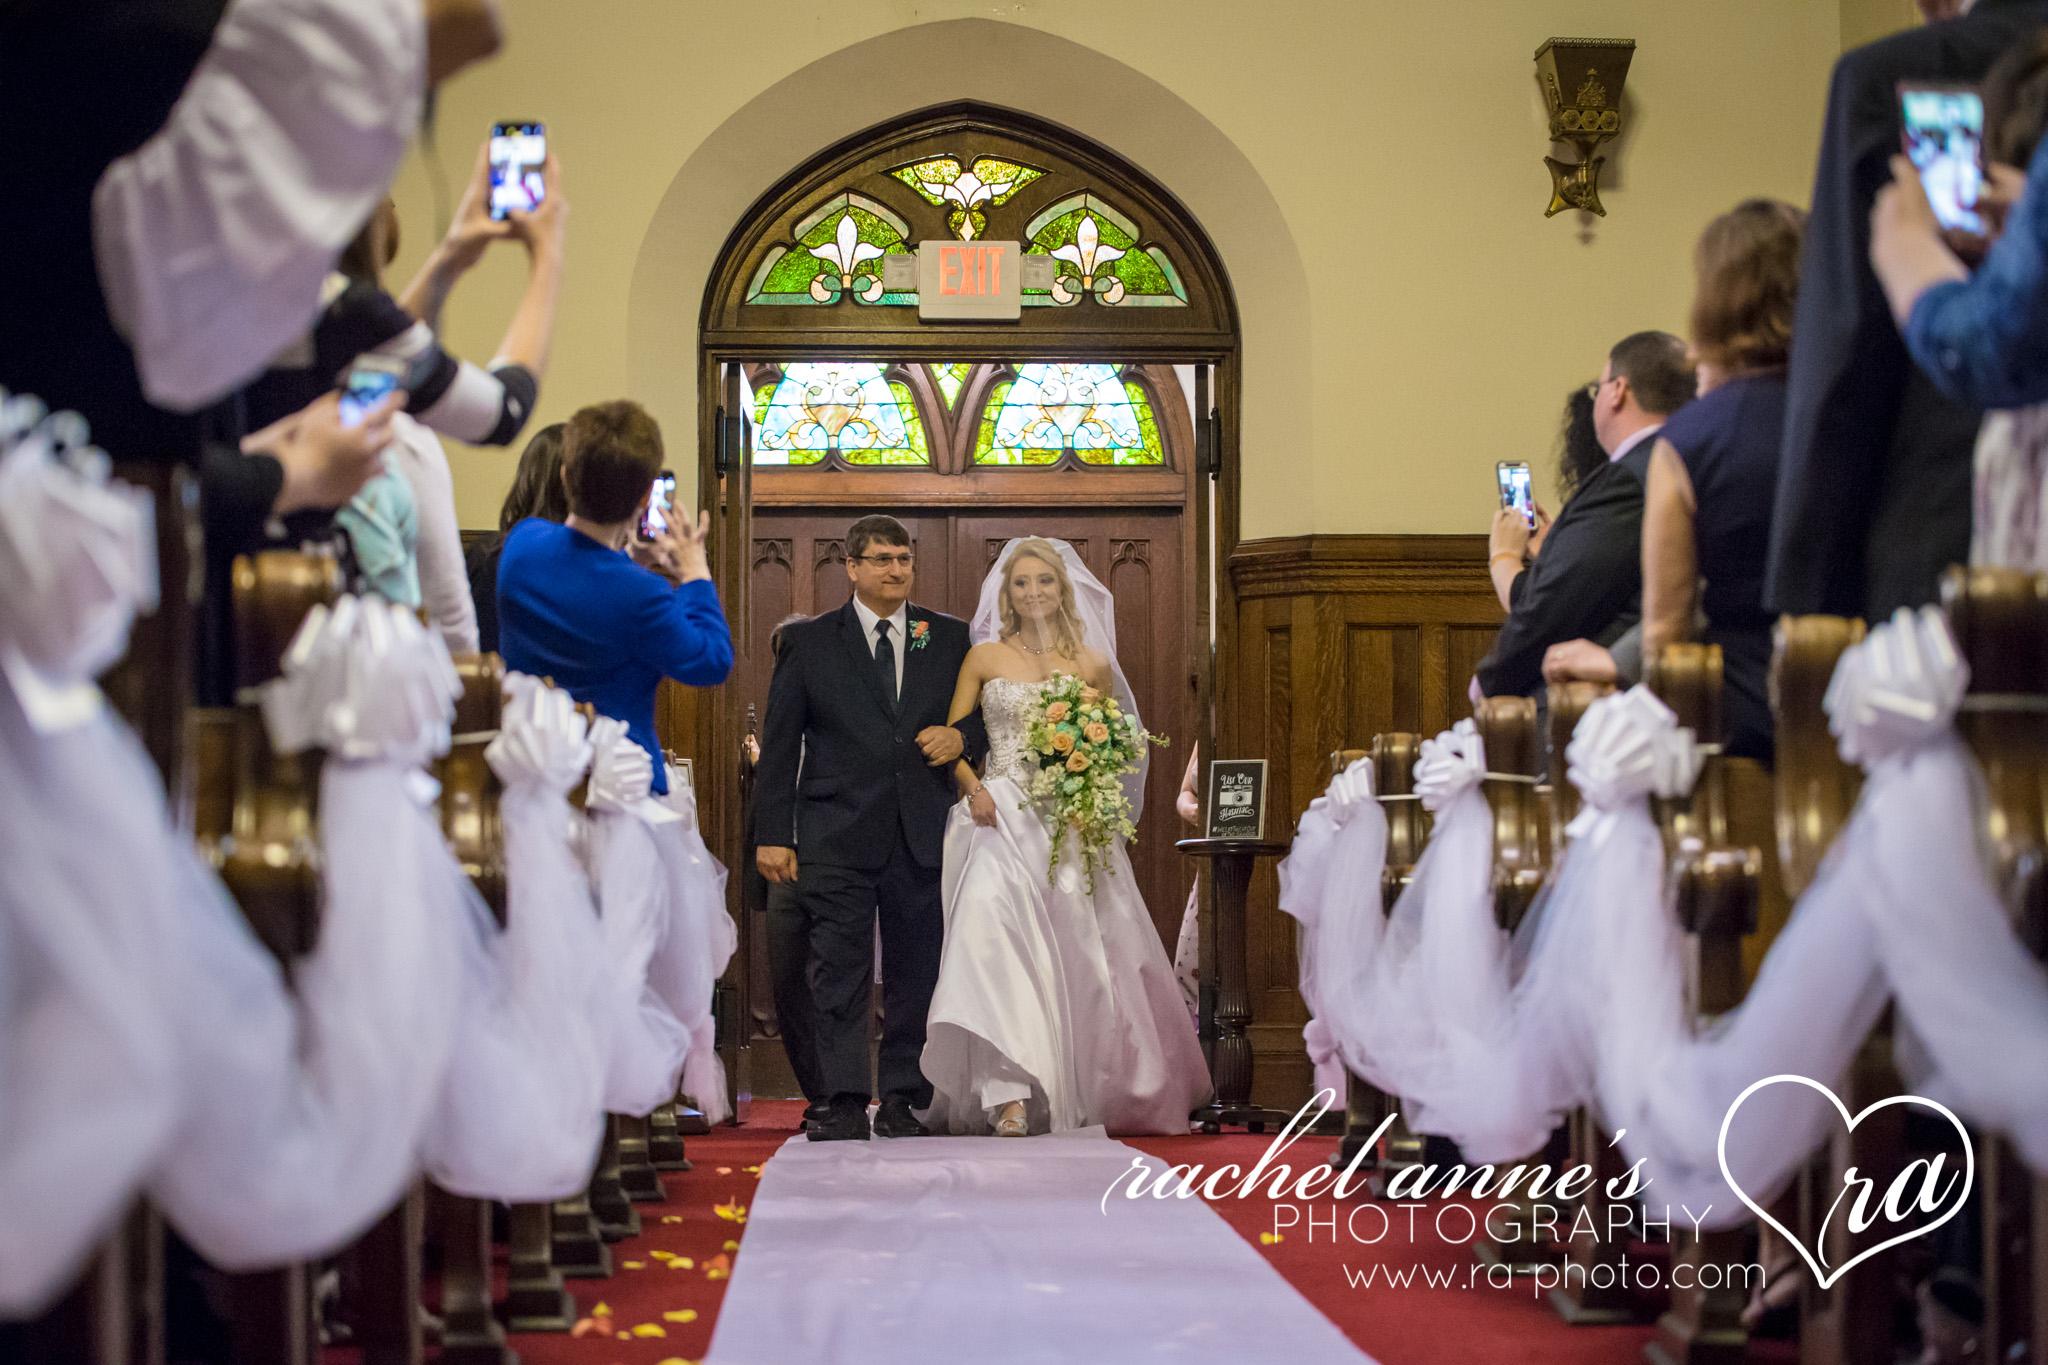 018-JKS-WEDDINGS-THE-FRANKLIN-PA.jpg